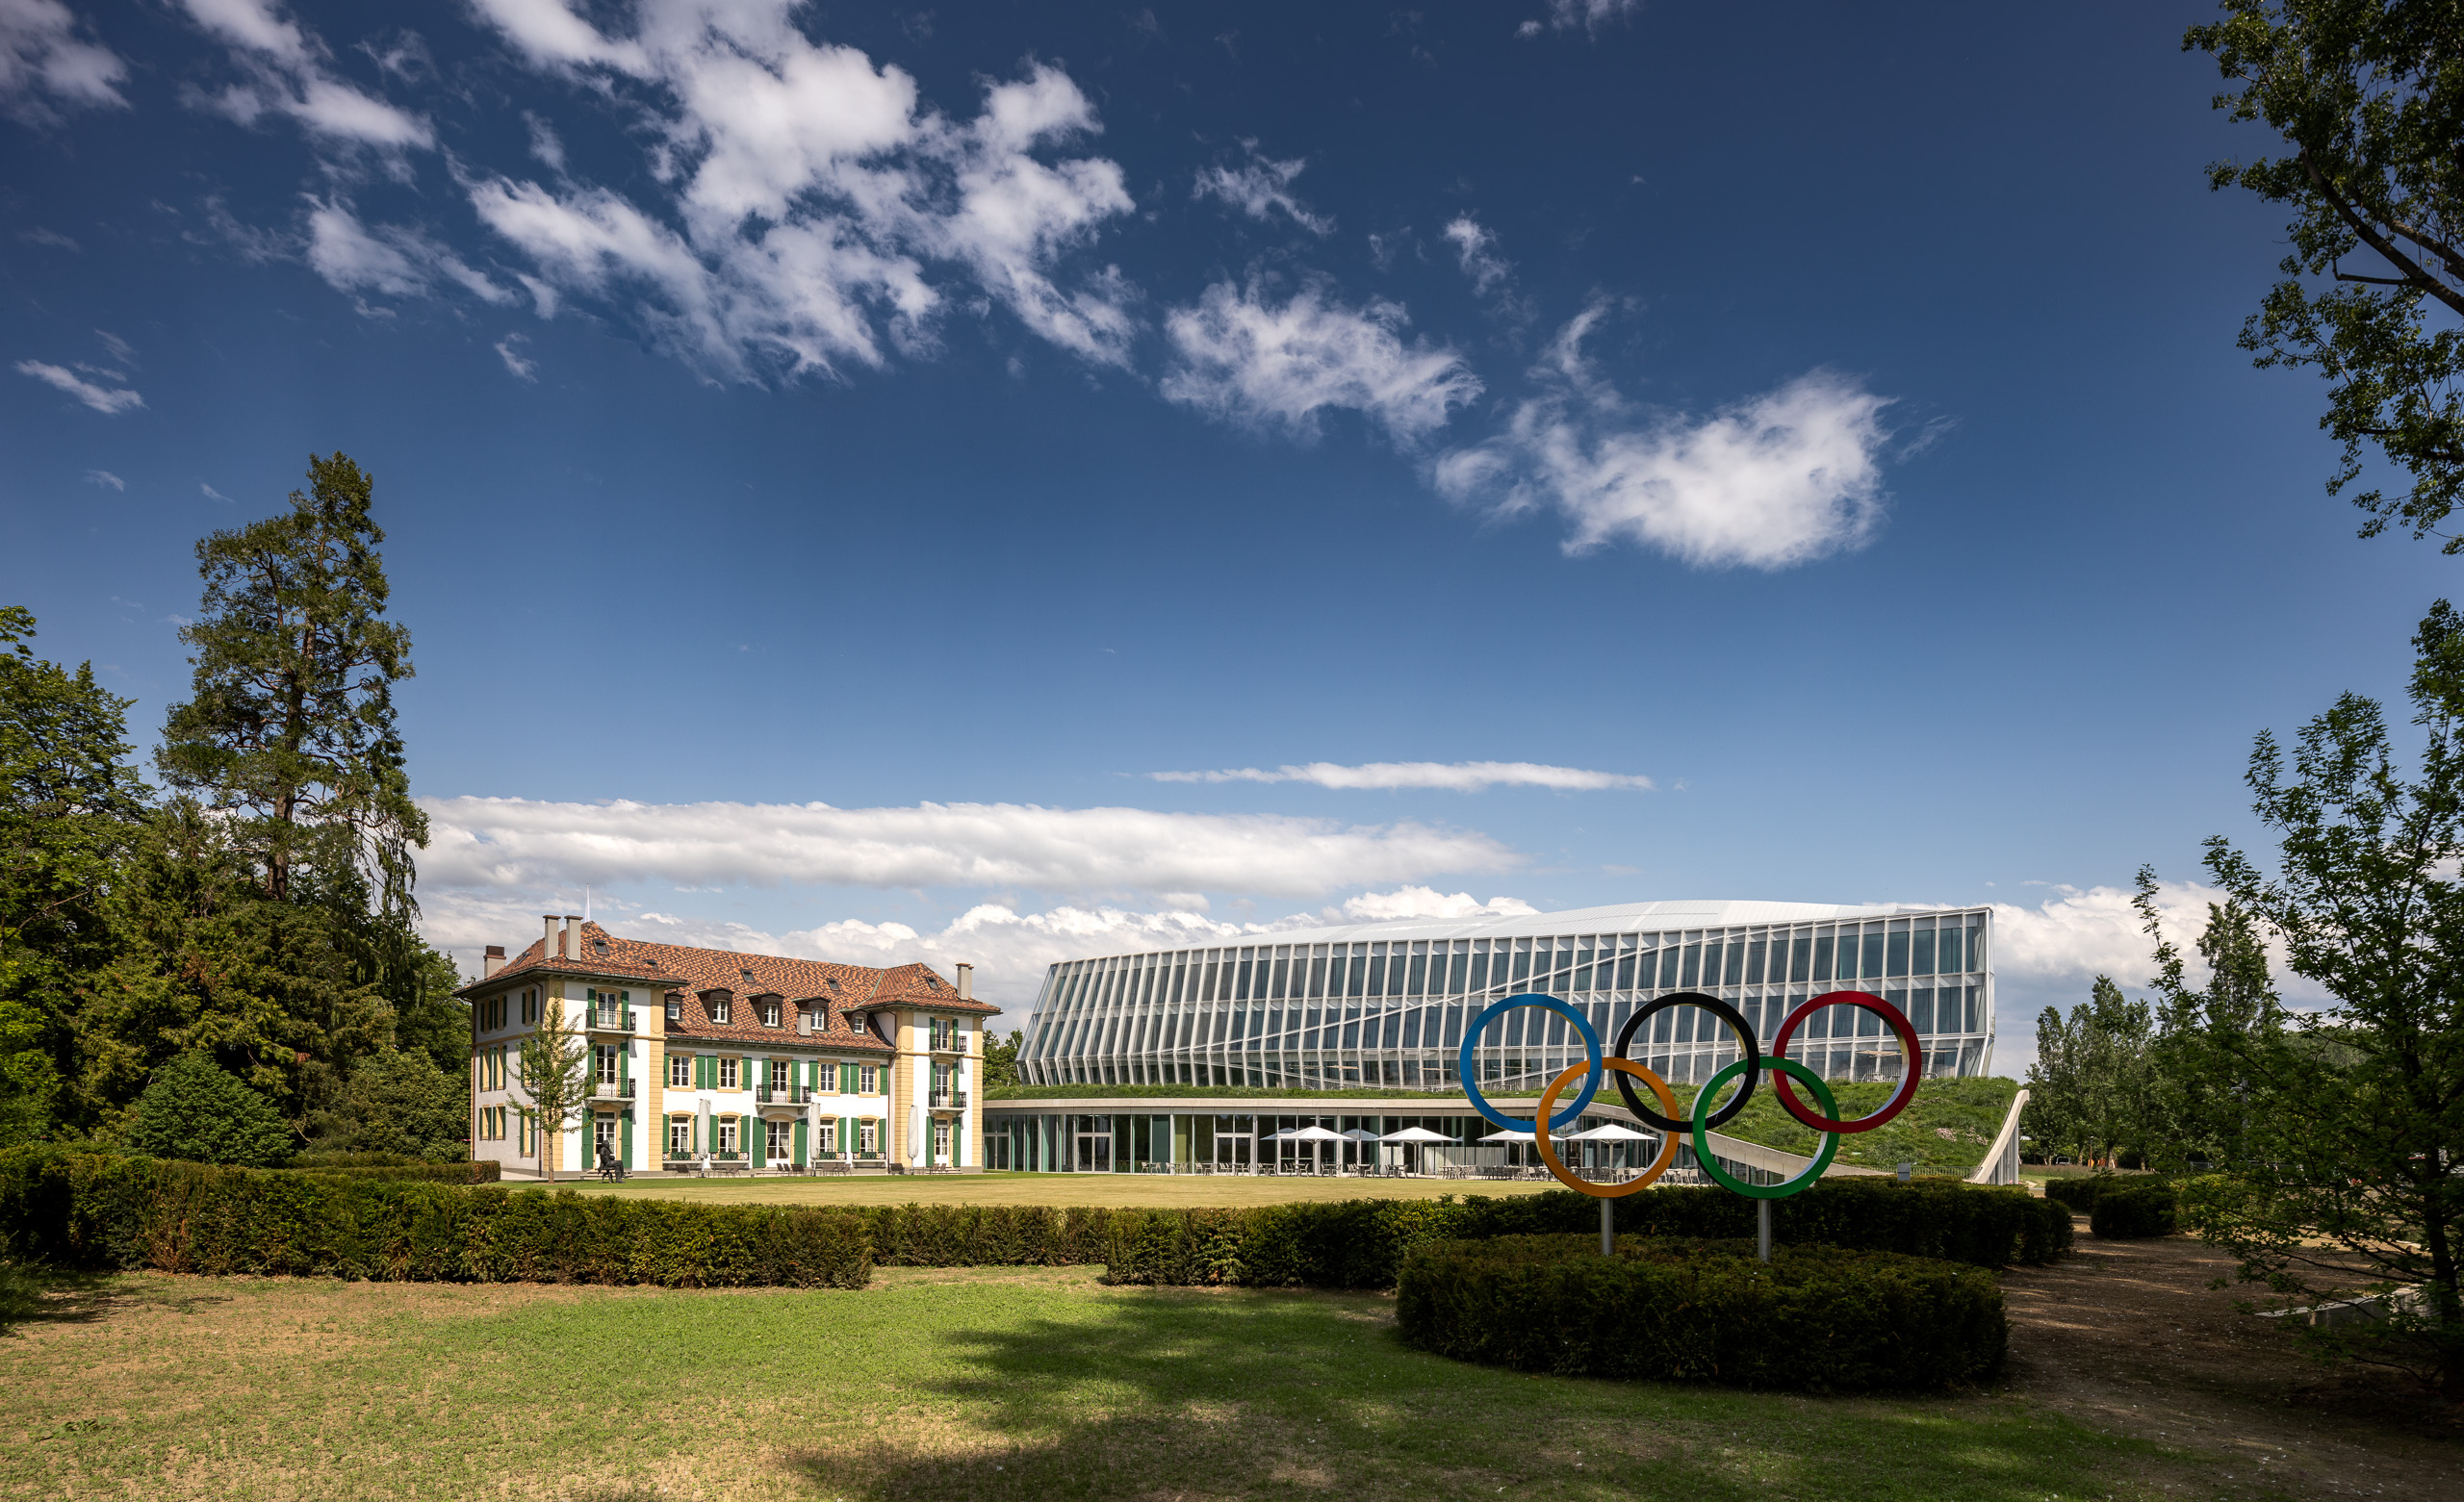 <p>Olympic House Lausanne door 3XN © 2019 / International Olympic Committee (IOC) / MØRK, Adam</p>